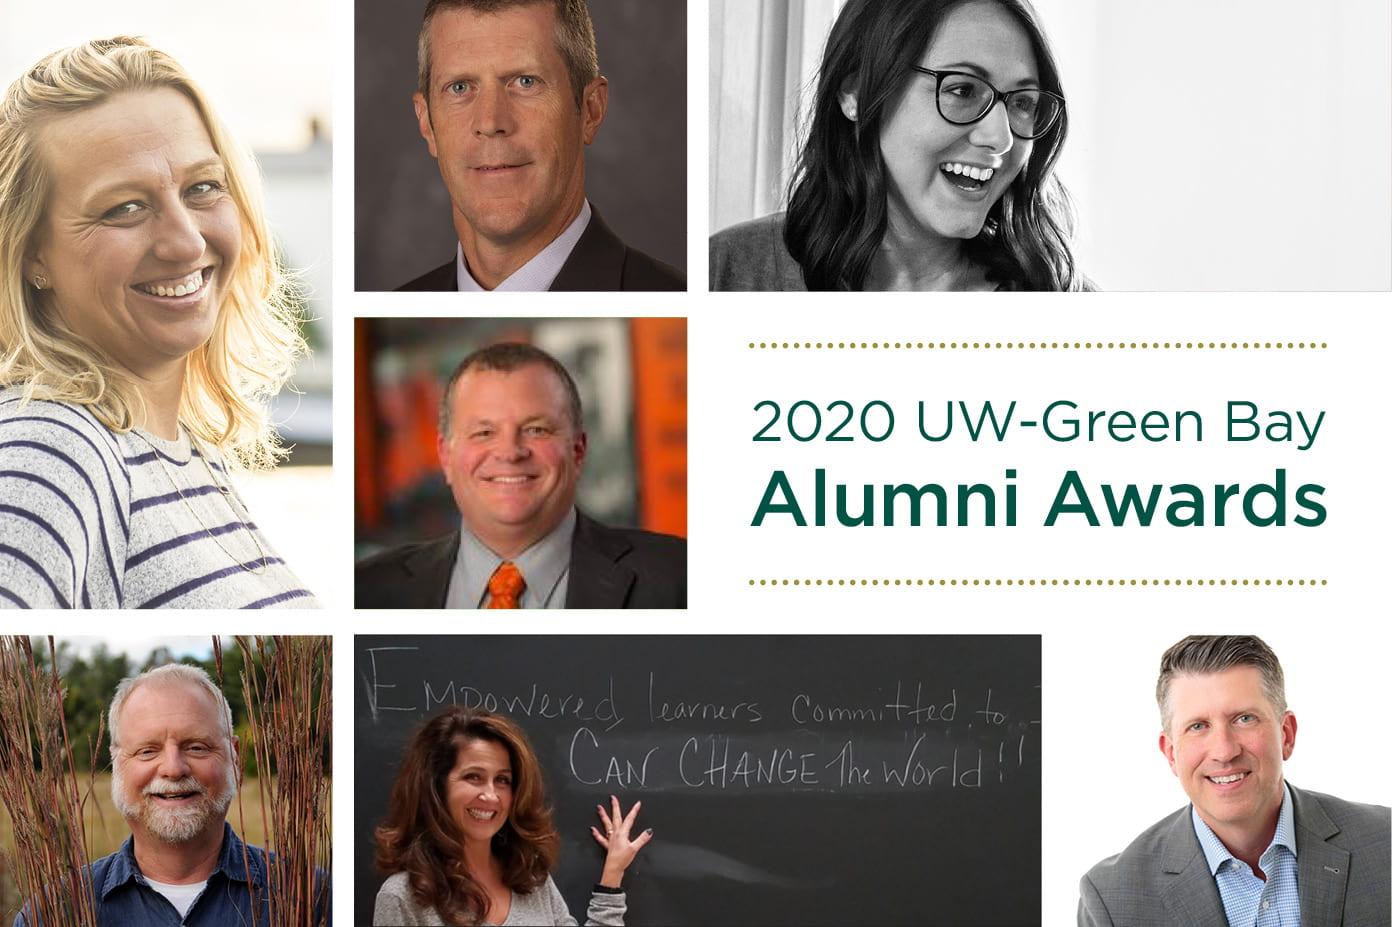 2020 UW-Green Bay Alumni Awards Collage